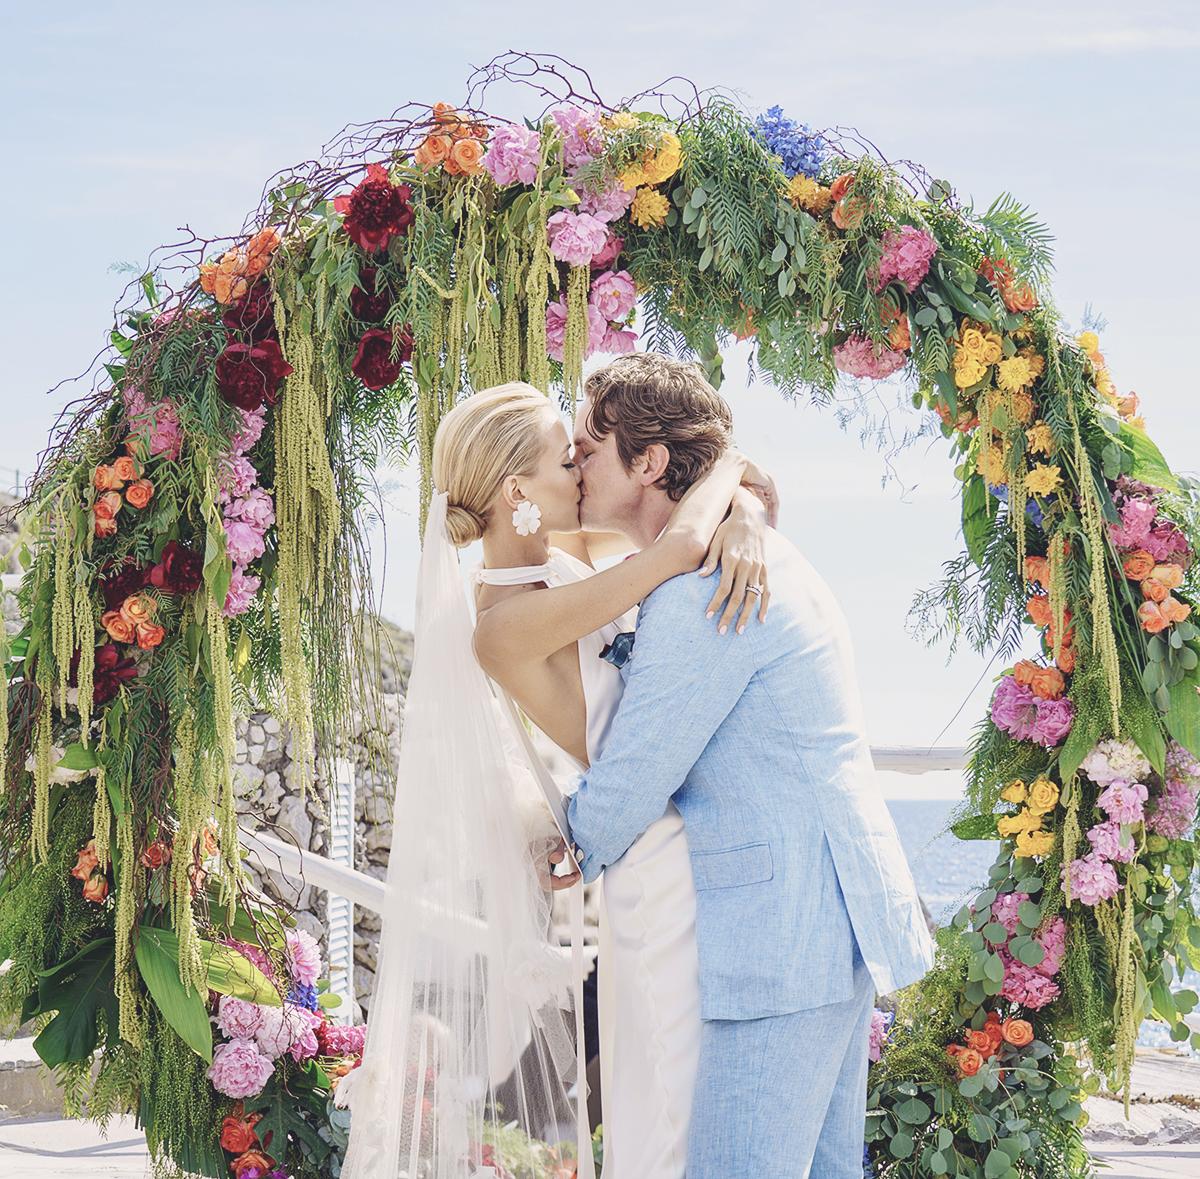 Songs For A Beach Wedding Ceremony: Beach Wedding In Capri. Restaurants In Capri.